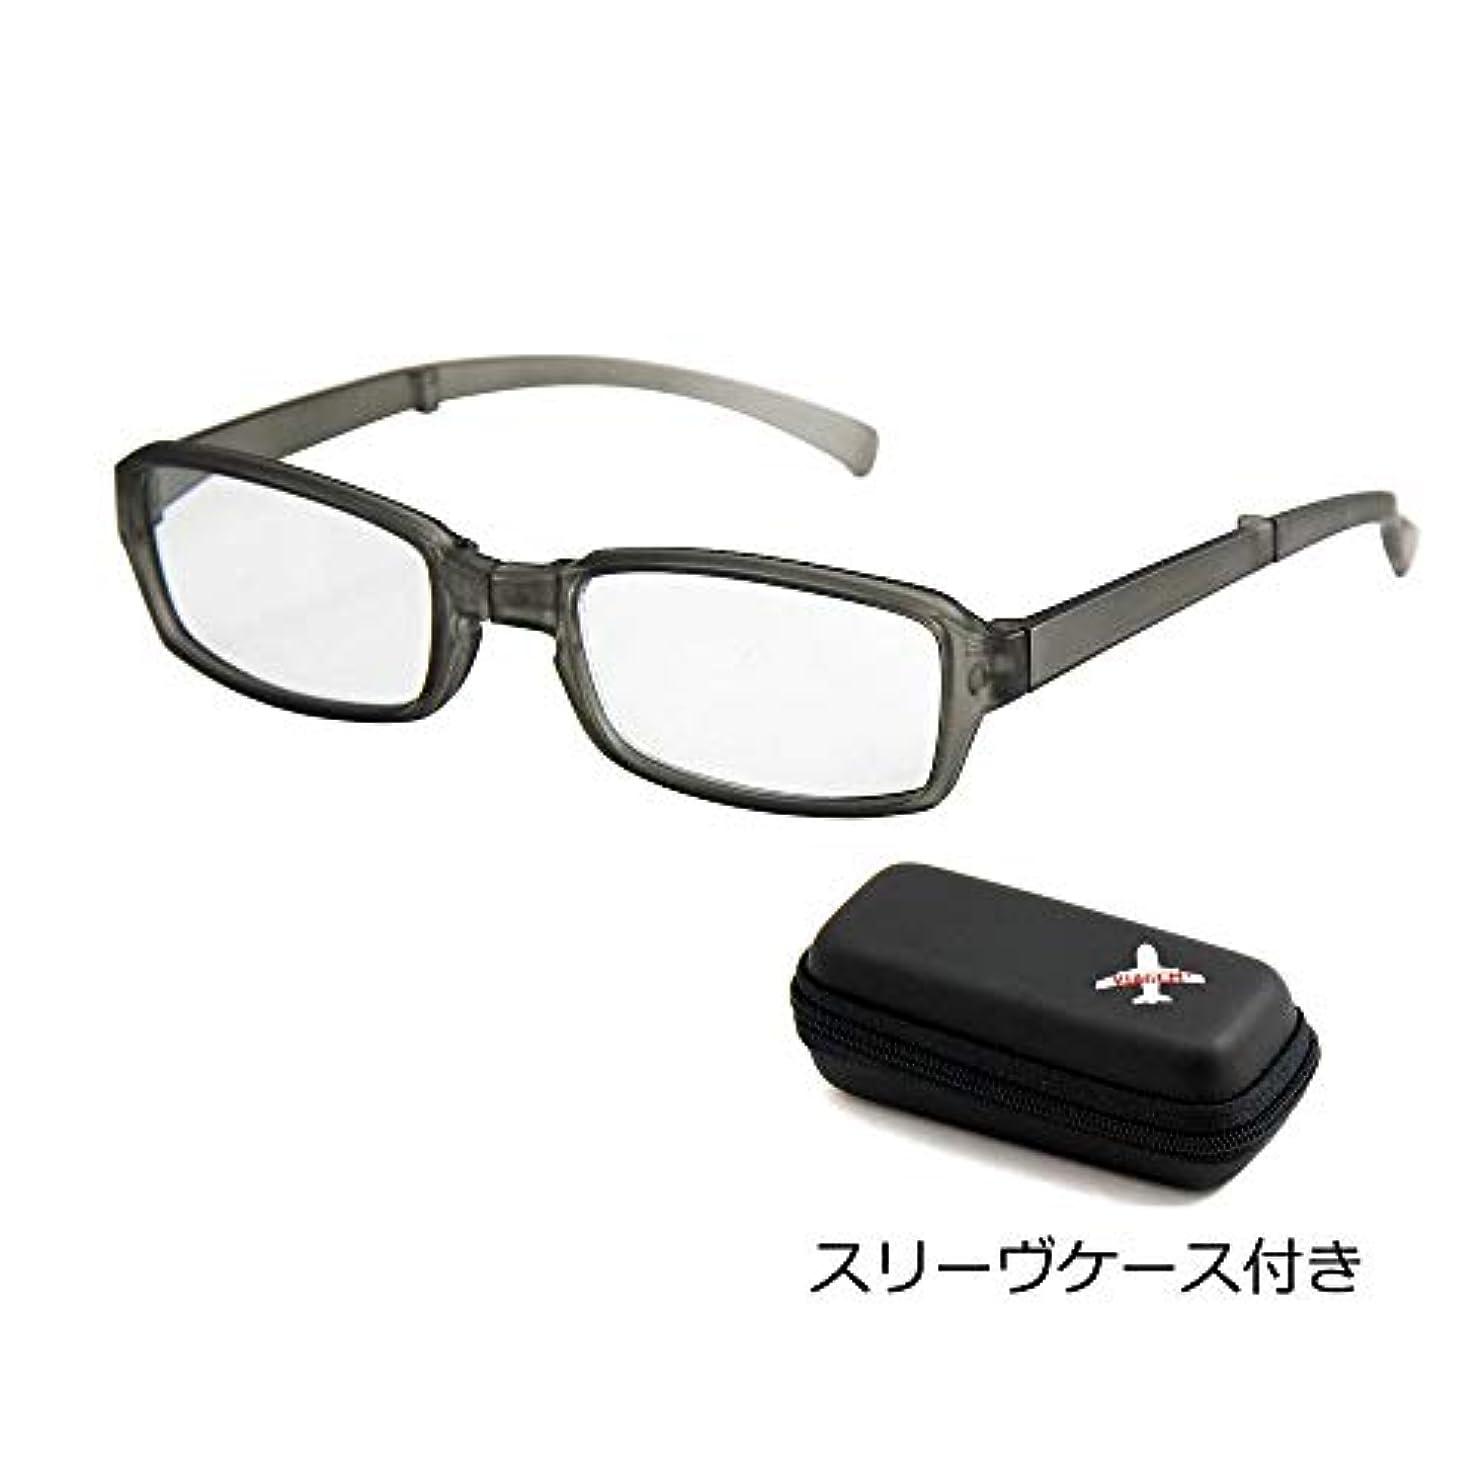 VIAGEM+ 折り畳めるリーディンググラス(老眼鏡) Mat GRAY VFR-02-2 +1.50(690020215) 【人気 おすすめ 通販パーク】